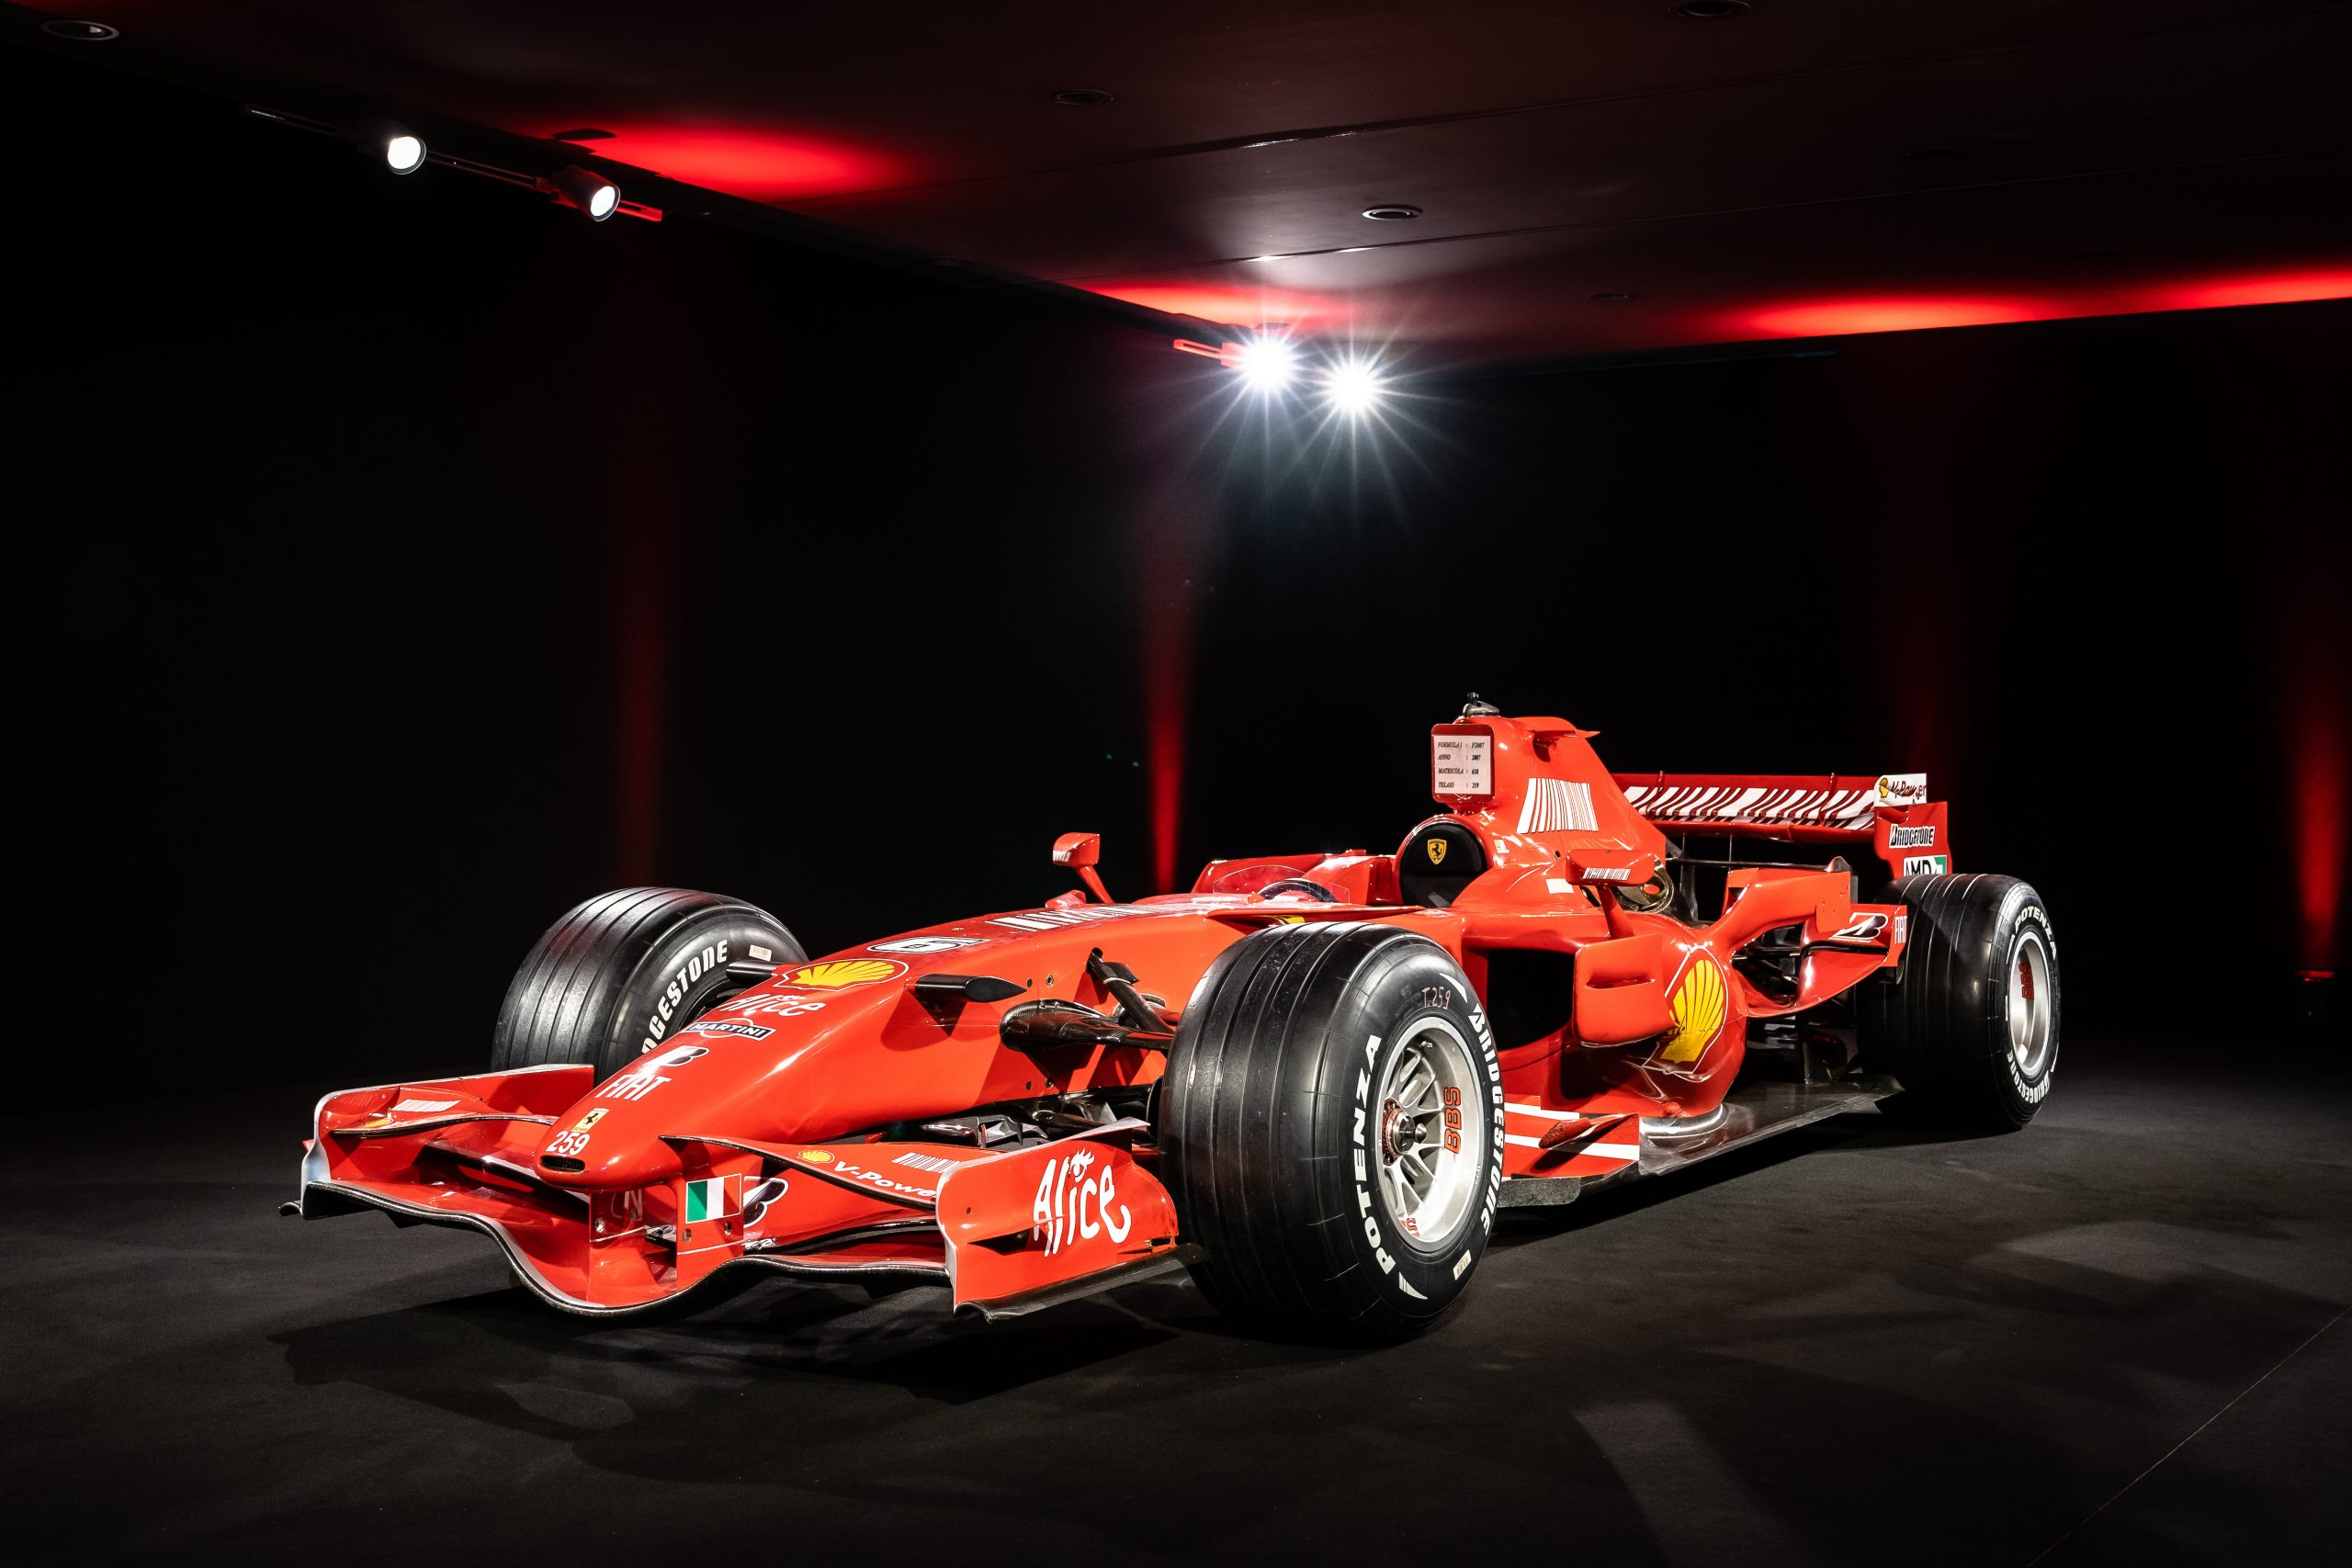 Ferrari F2007 - Front left